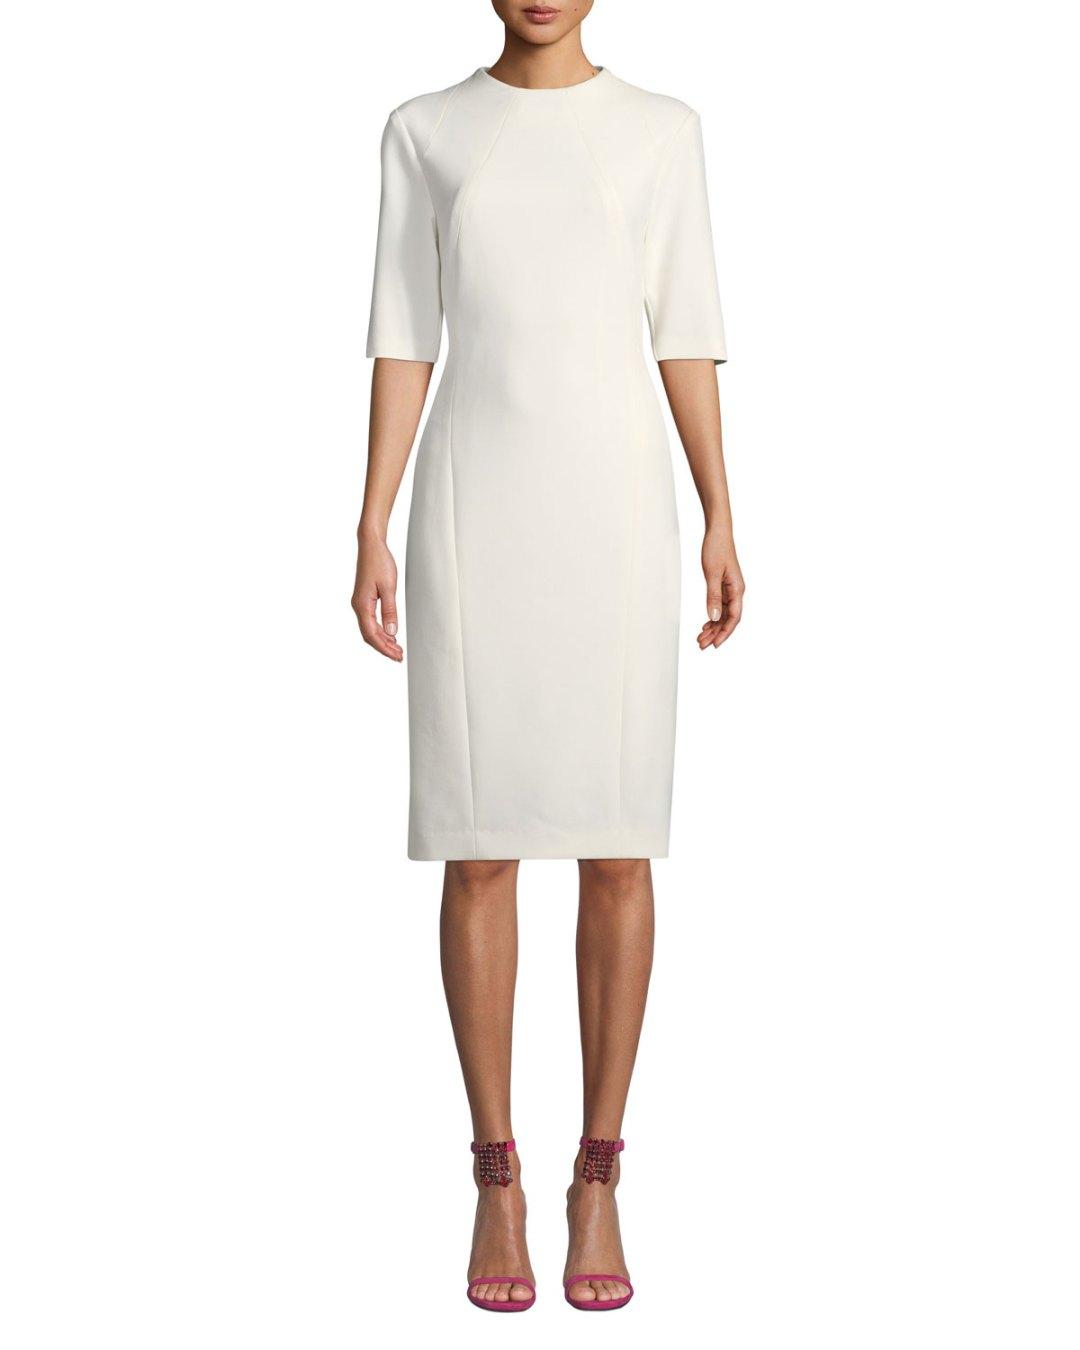 48ad5cd4d182d Neiman Marcus – Aperitif Double-Weave Bodycon Dress –  398.00